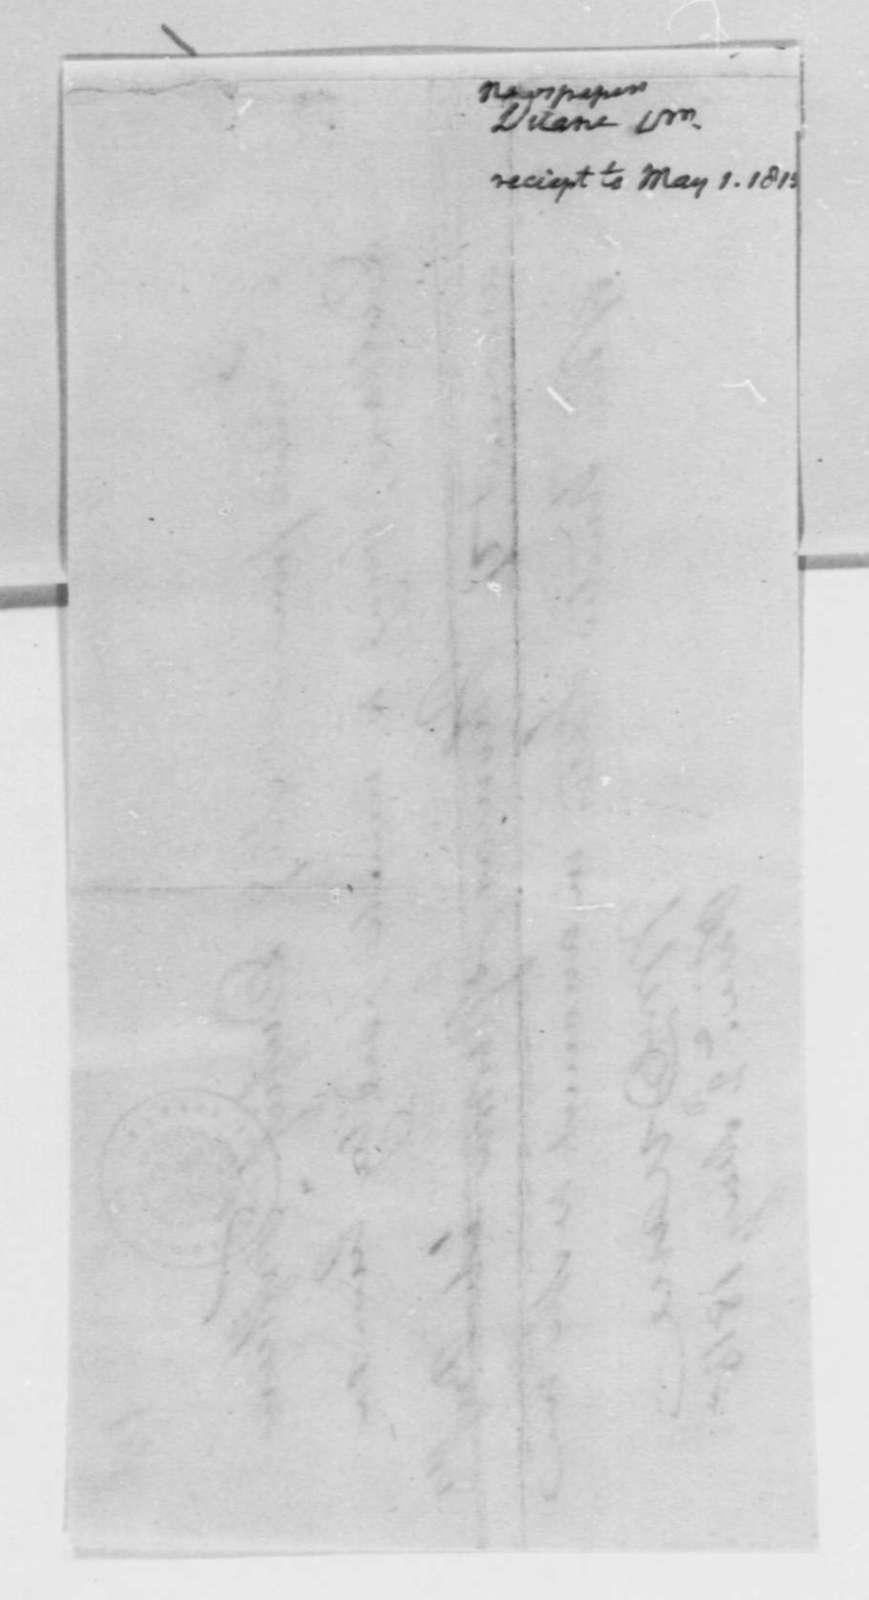 William Duane to Nicholas Gouin Dufief, May 2, 1815, Receipt